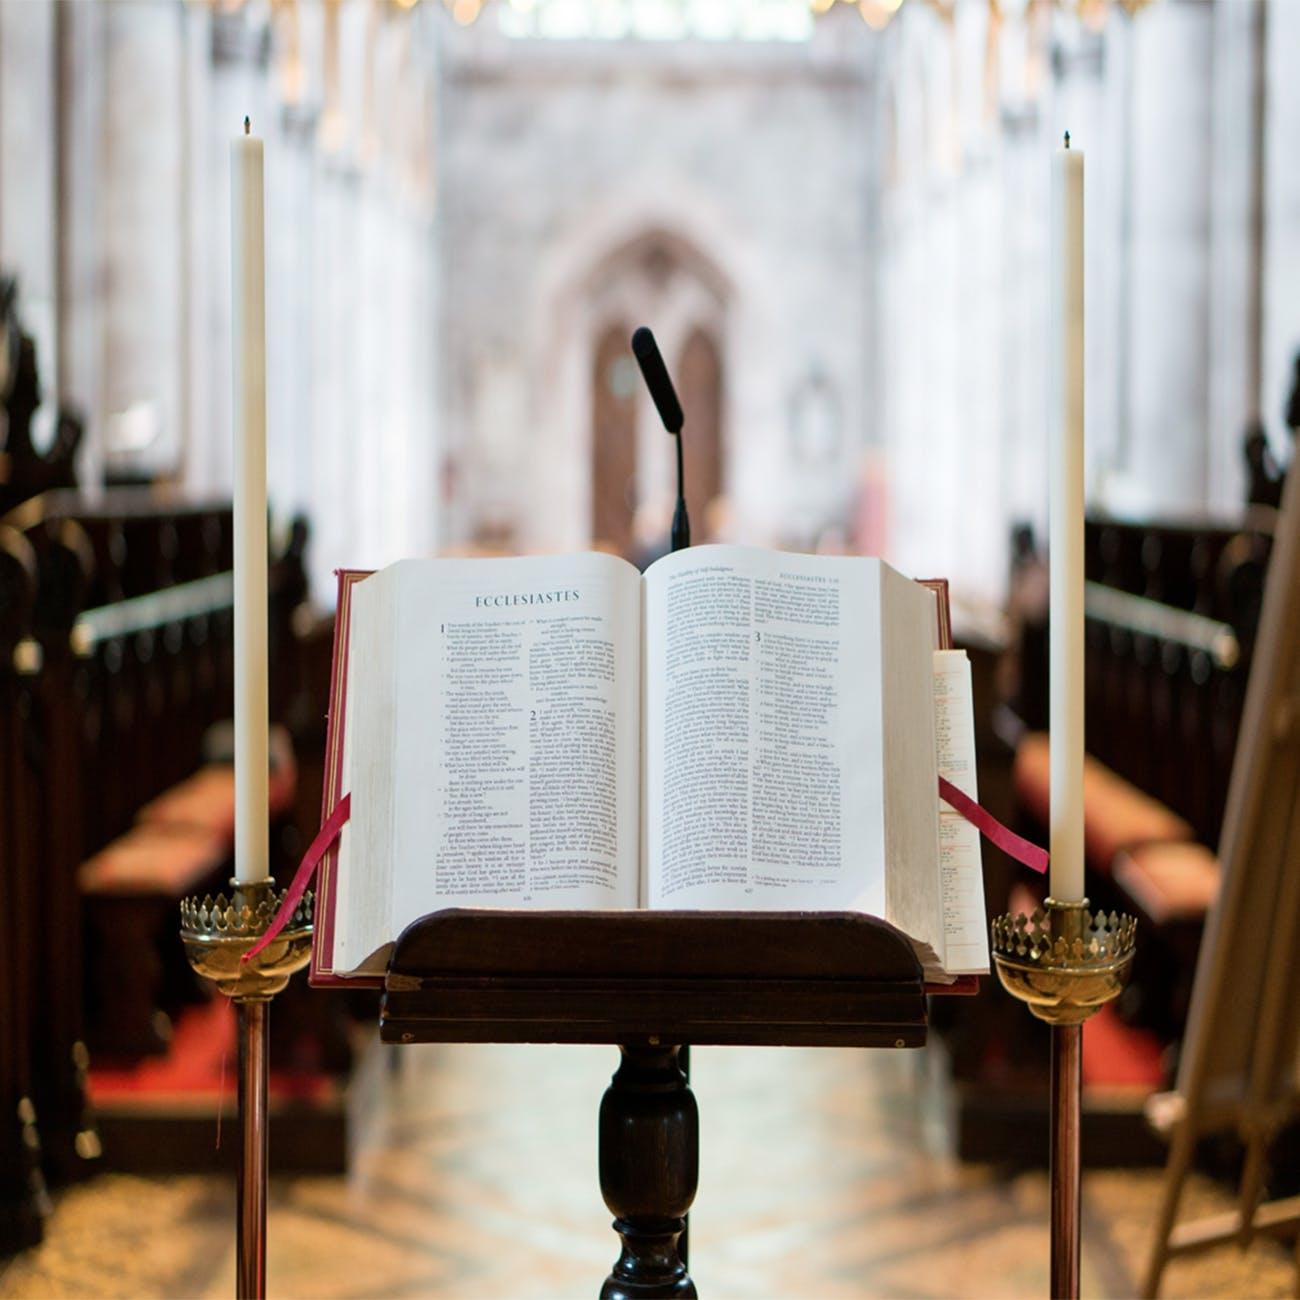 Christian Photo of Worship by Pixabay